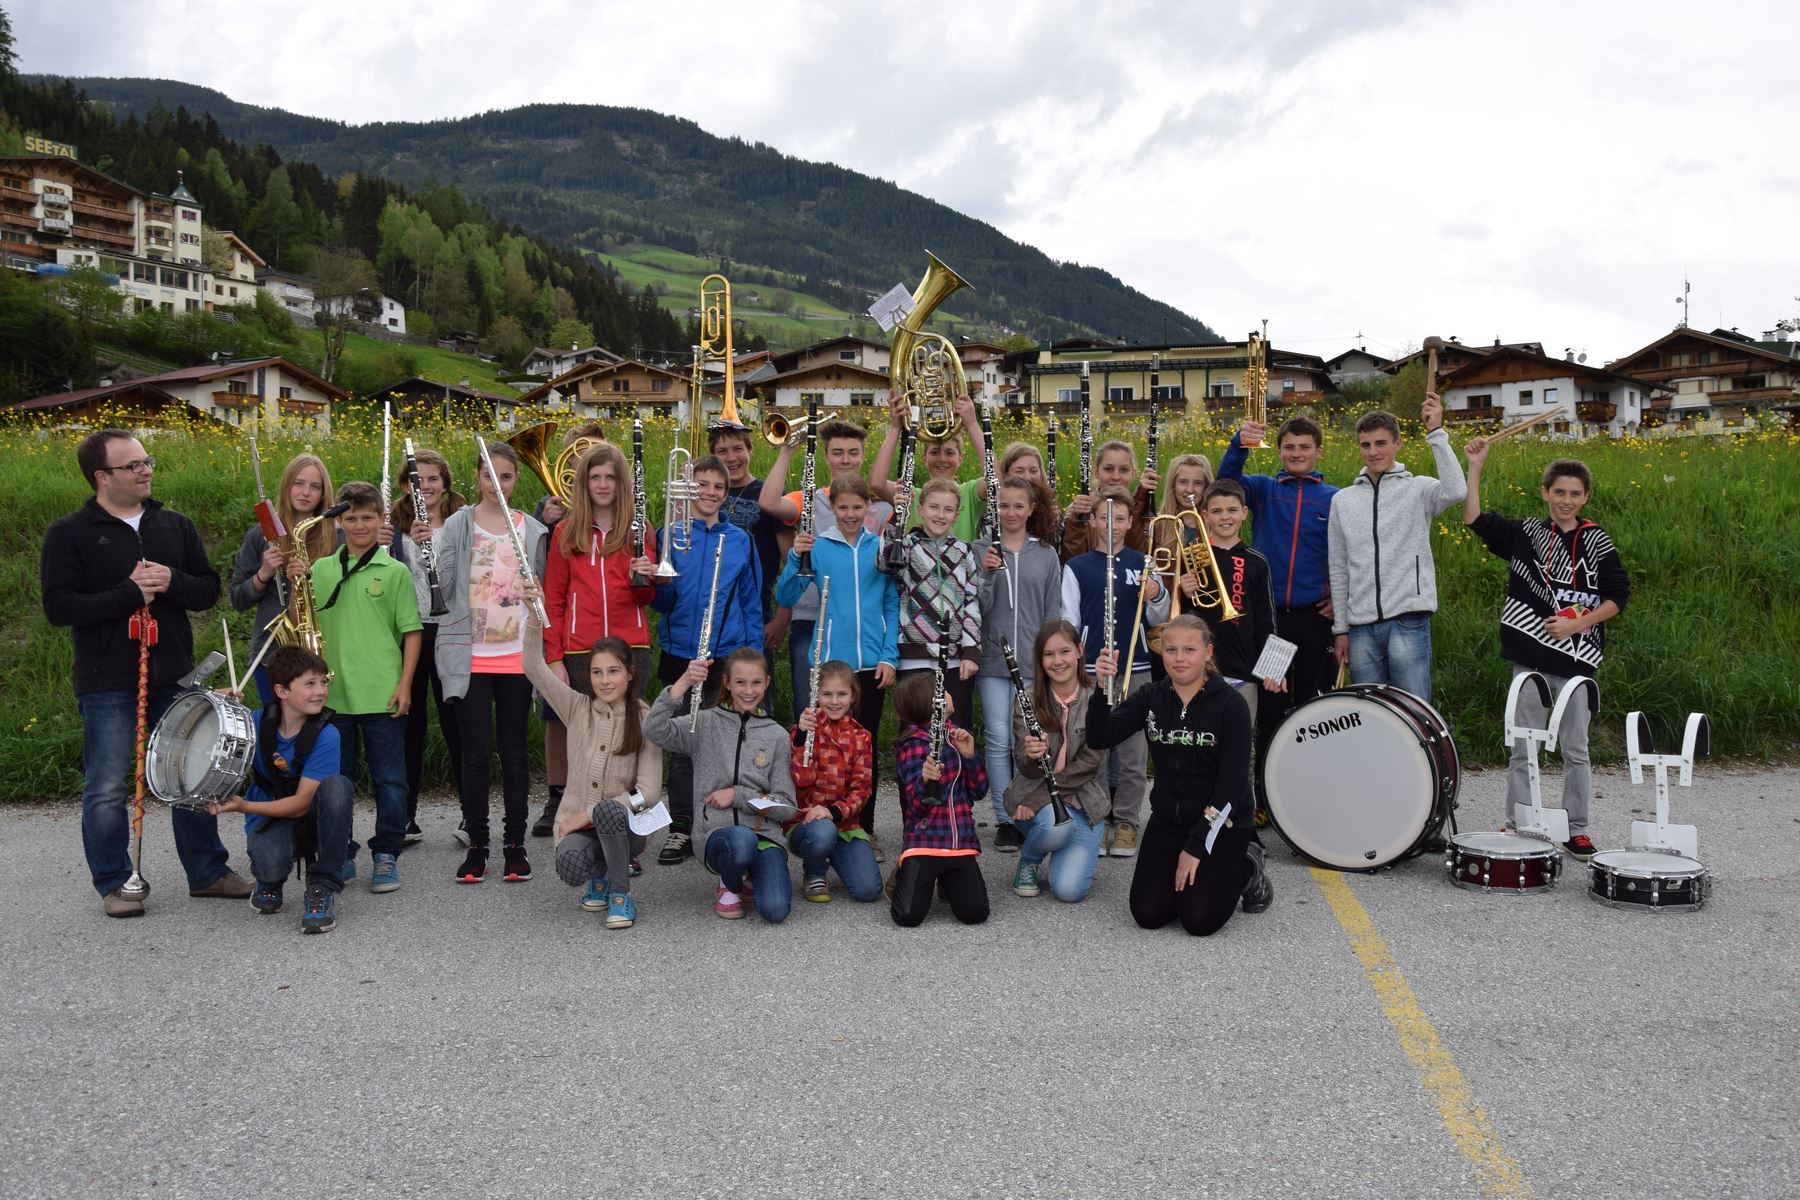 2015-05-02 Marschierprobe Jugend (26).jpg